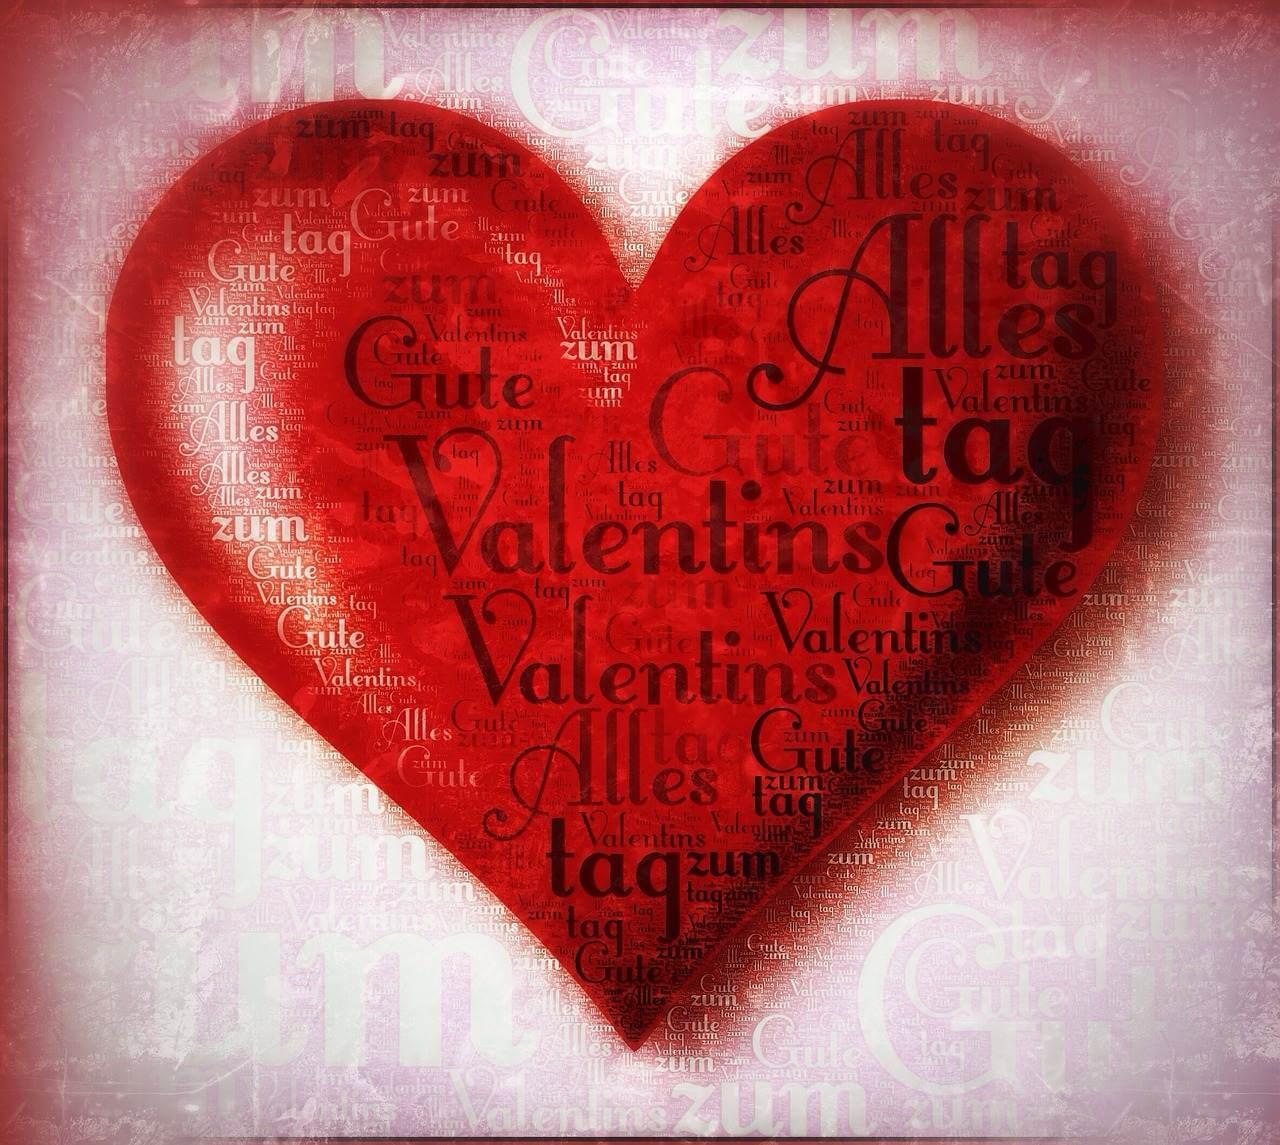 Valentinstag 2015